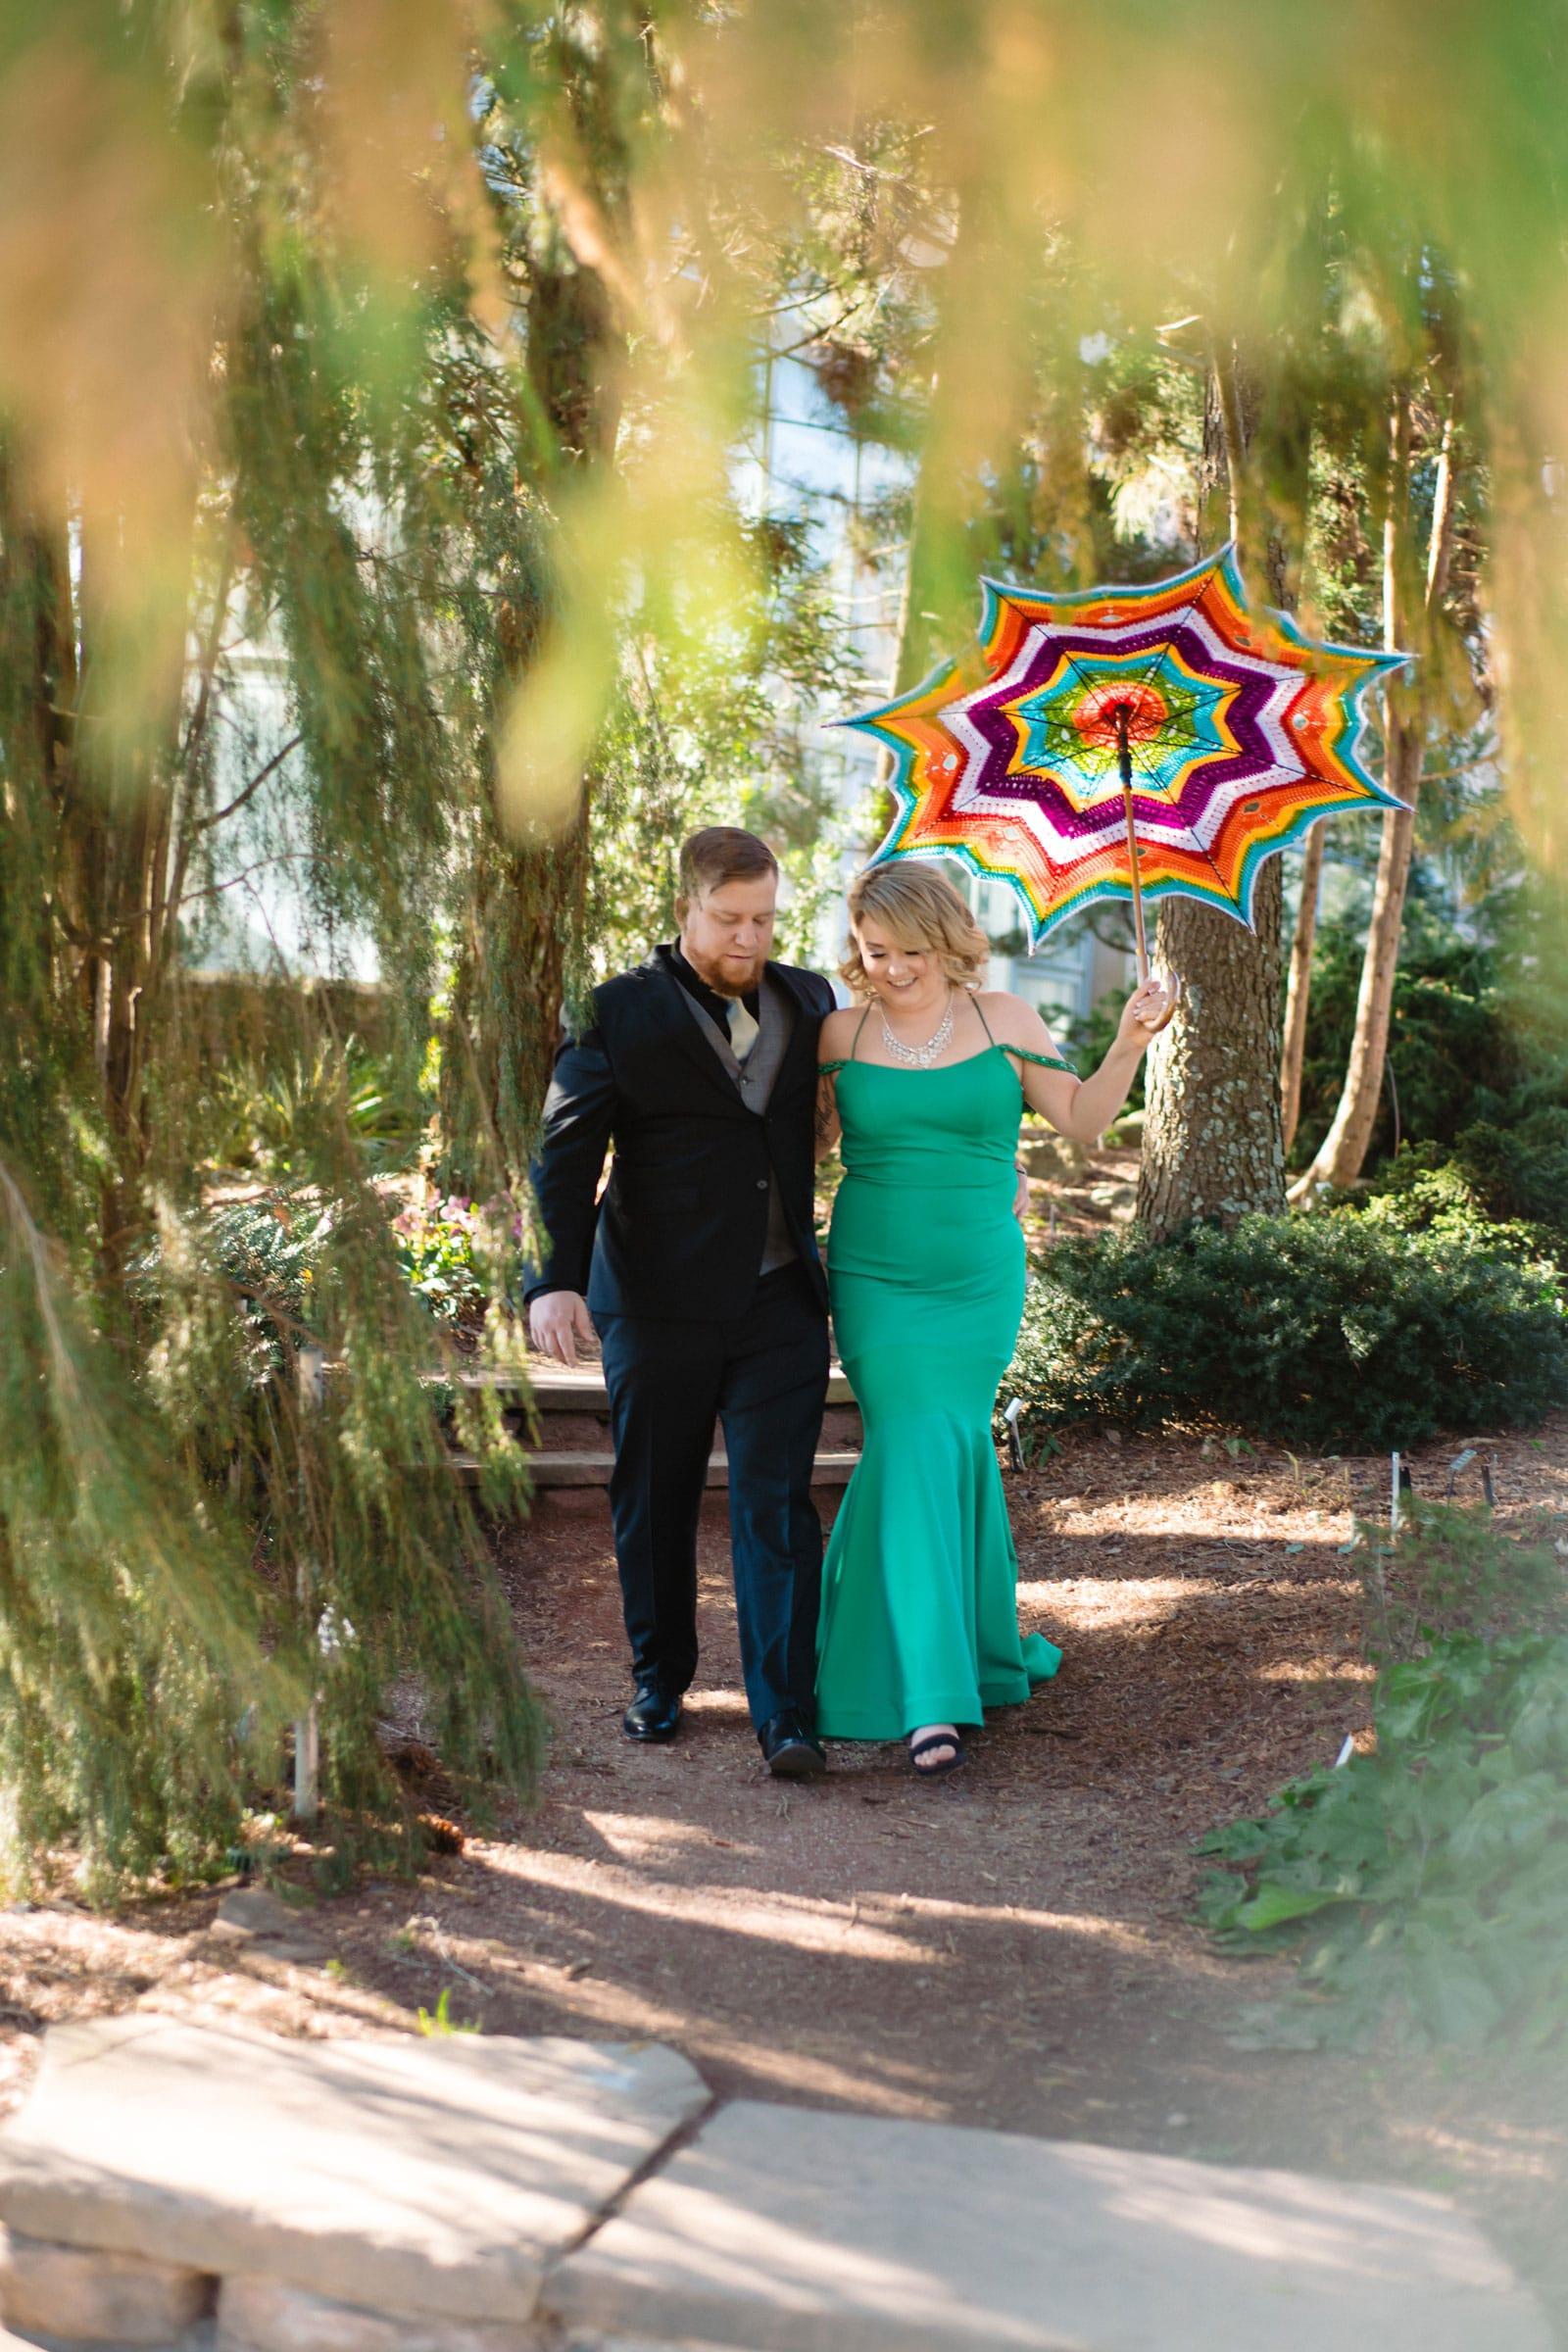 bride and groom walk through Atlanta Botanical Gardens with colorful umbrella